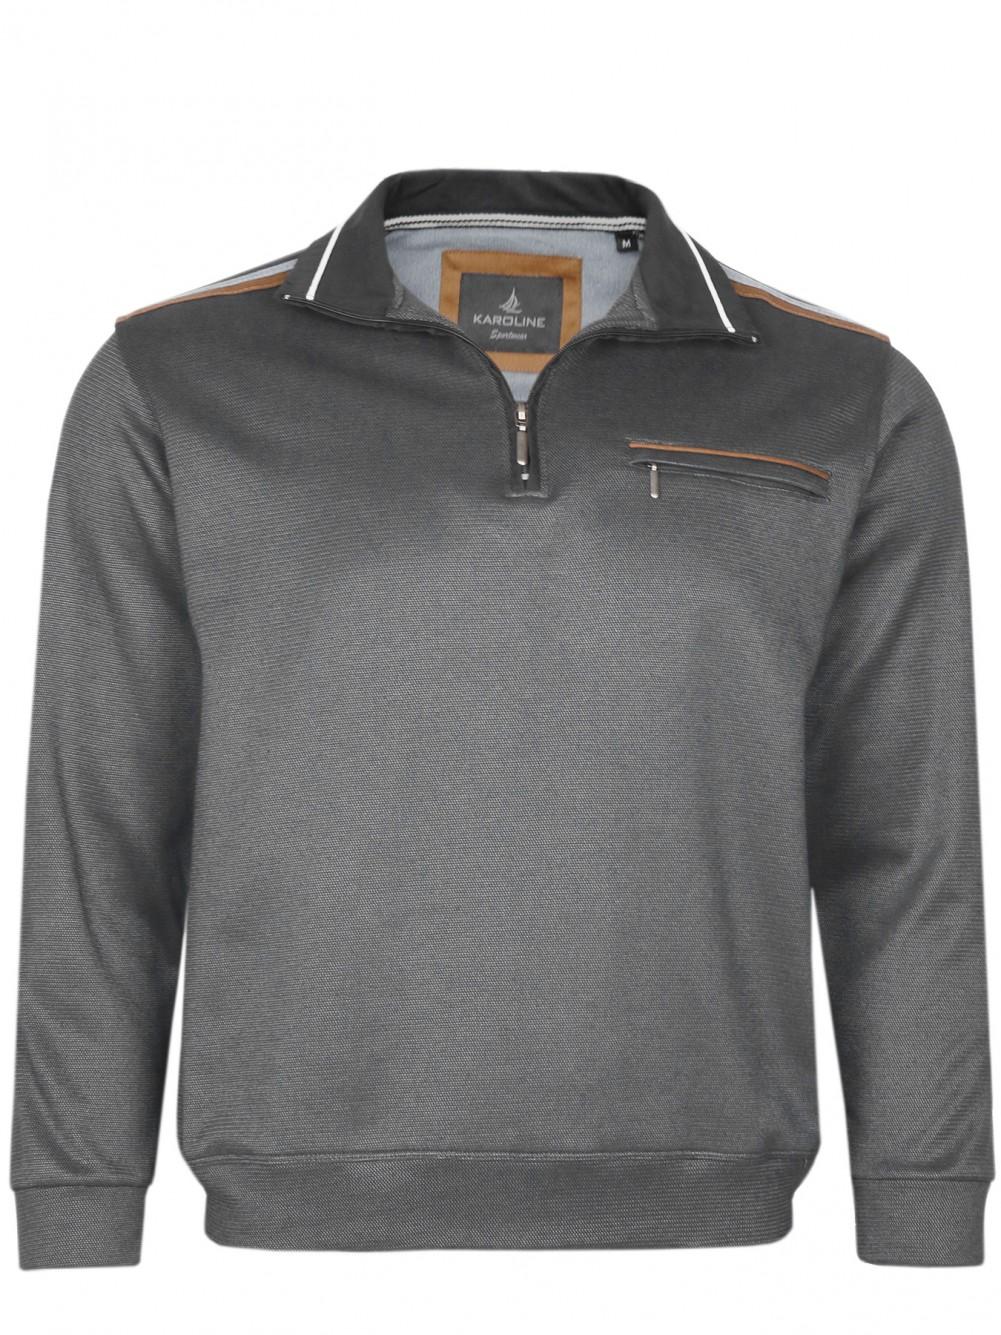 Herren Baumwoll-Piqué Polo-Shirt in Blouson-Form - Anthrazit